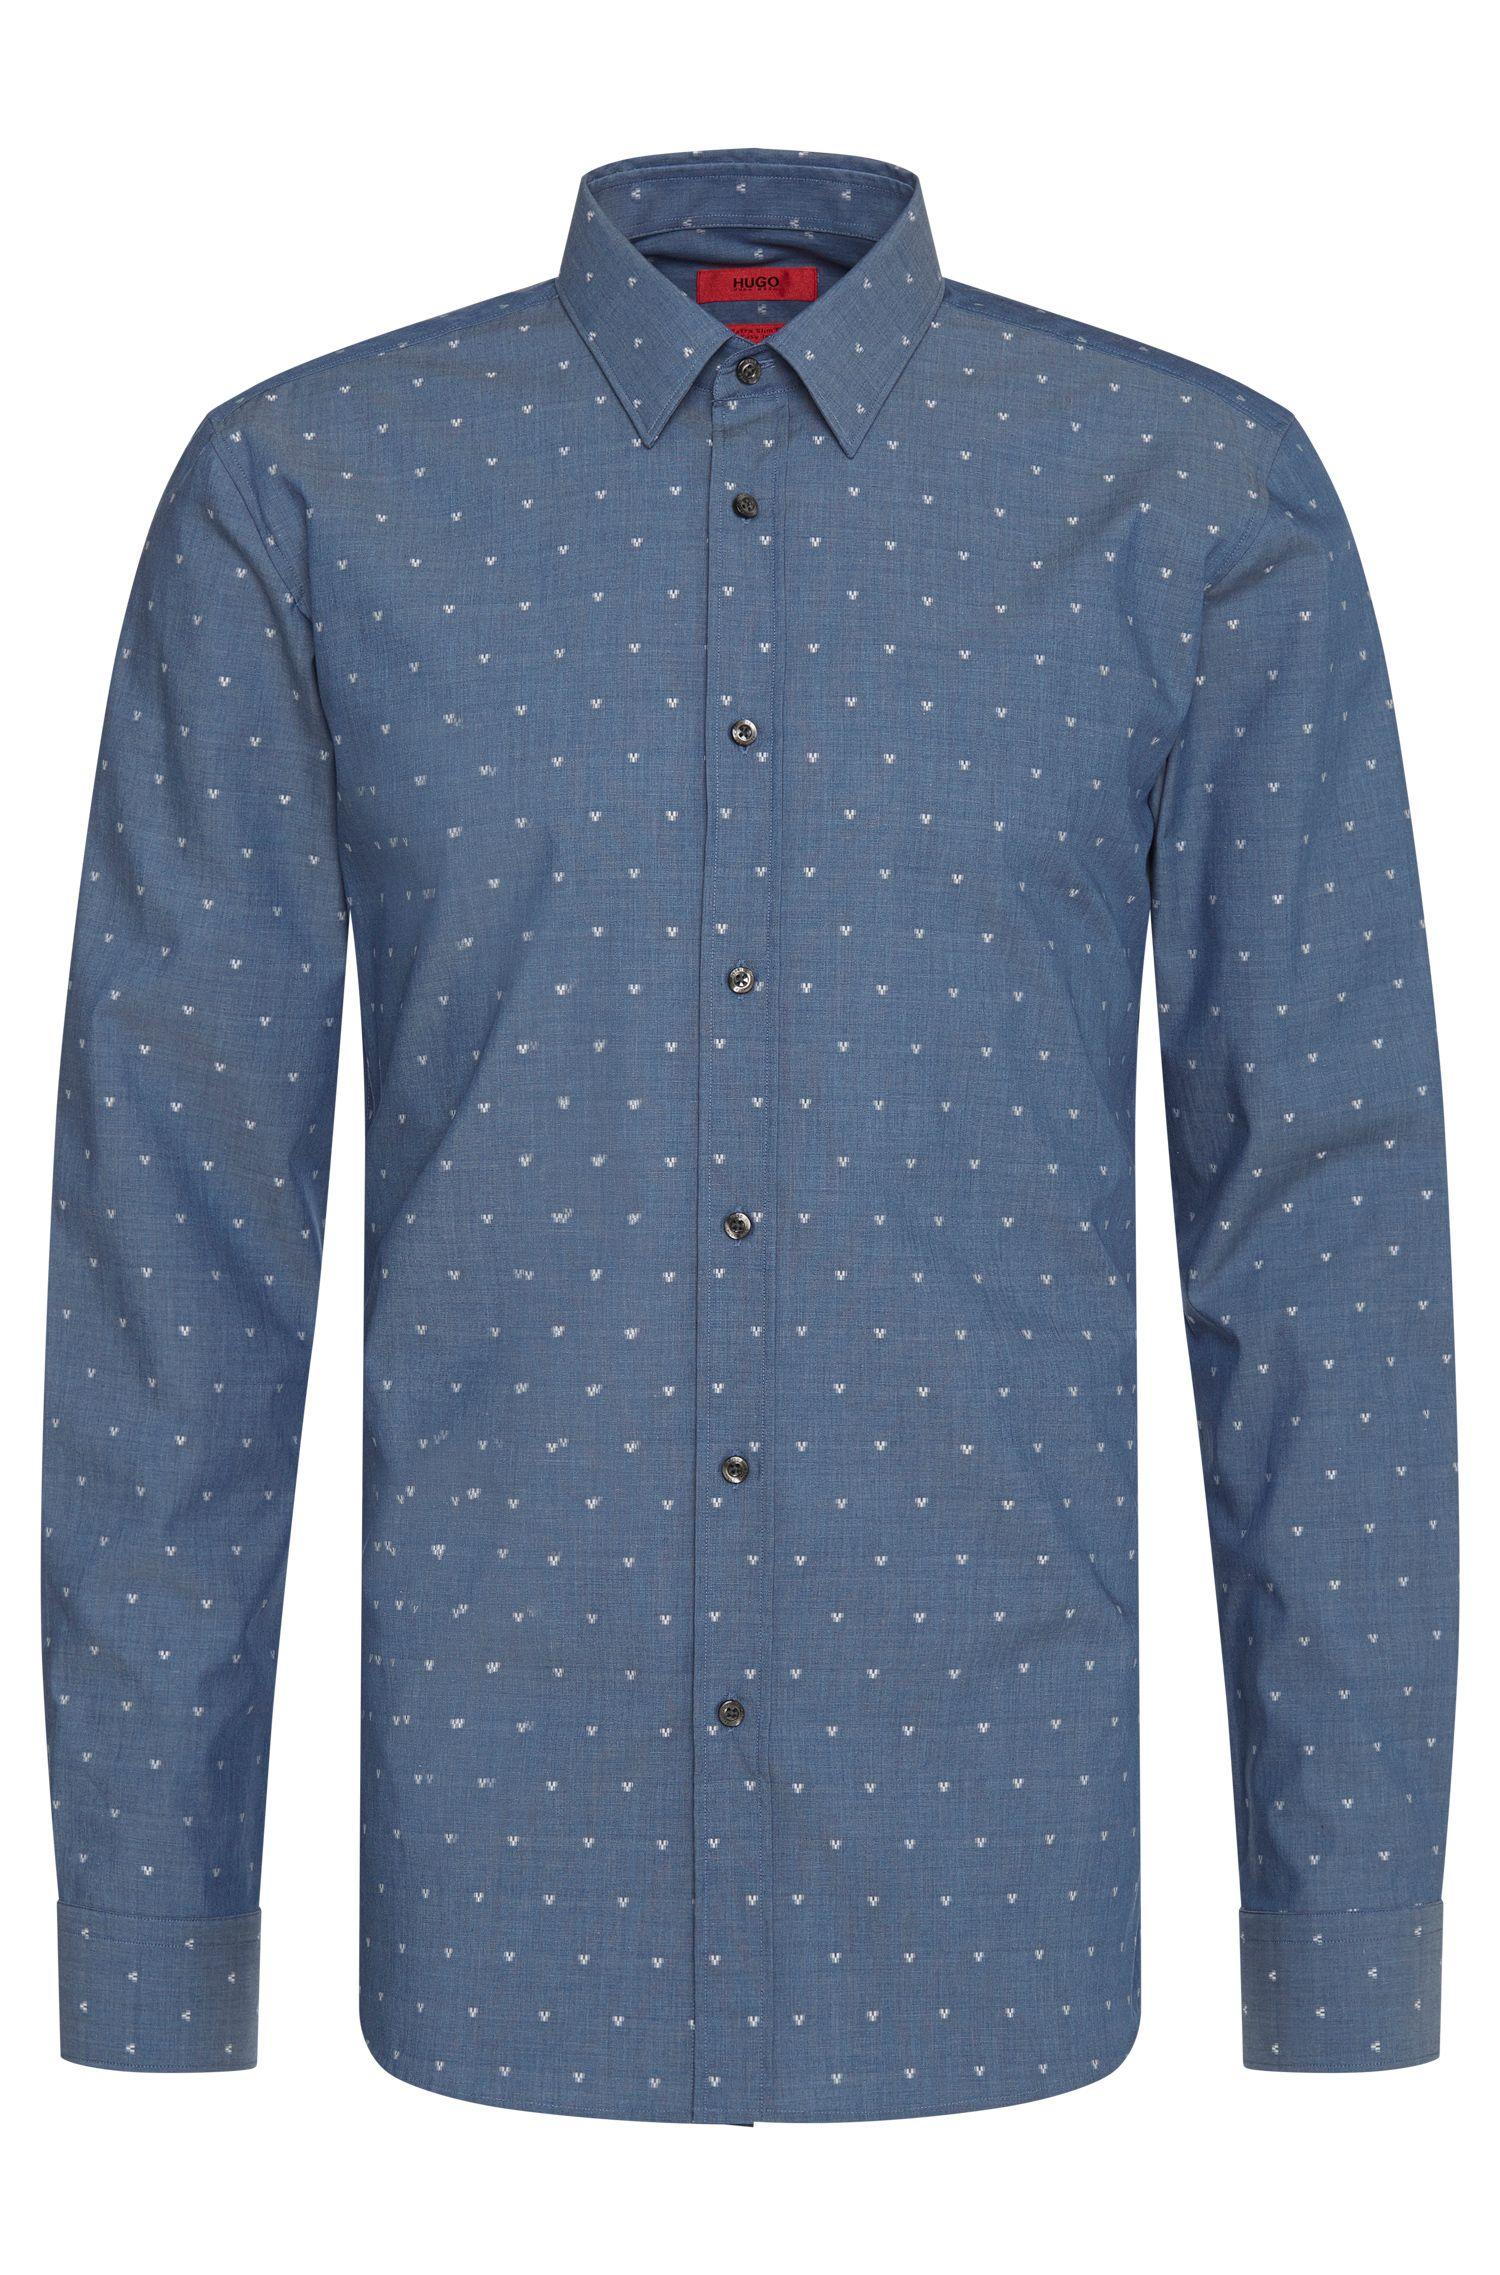 Gemustertes Extra Slim-Fit Hemd aus Baumwolle: 'Elisha'